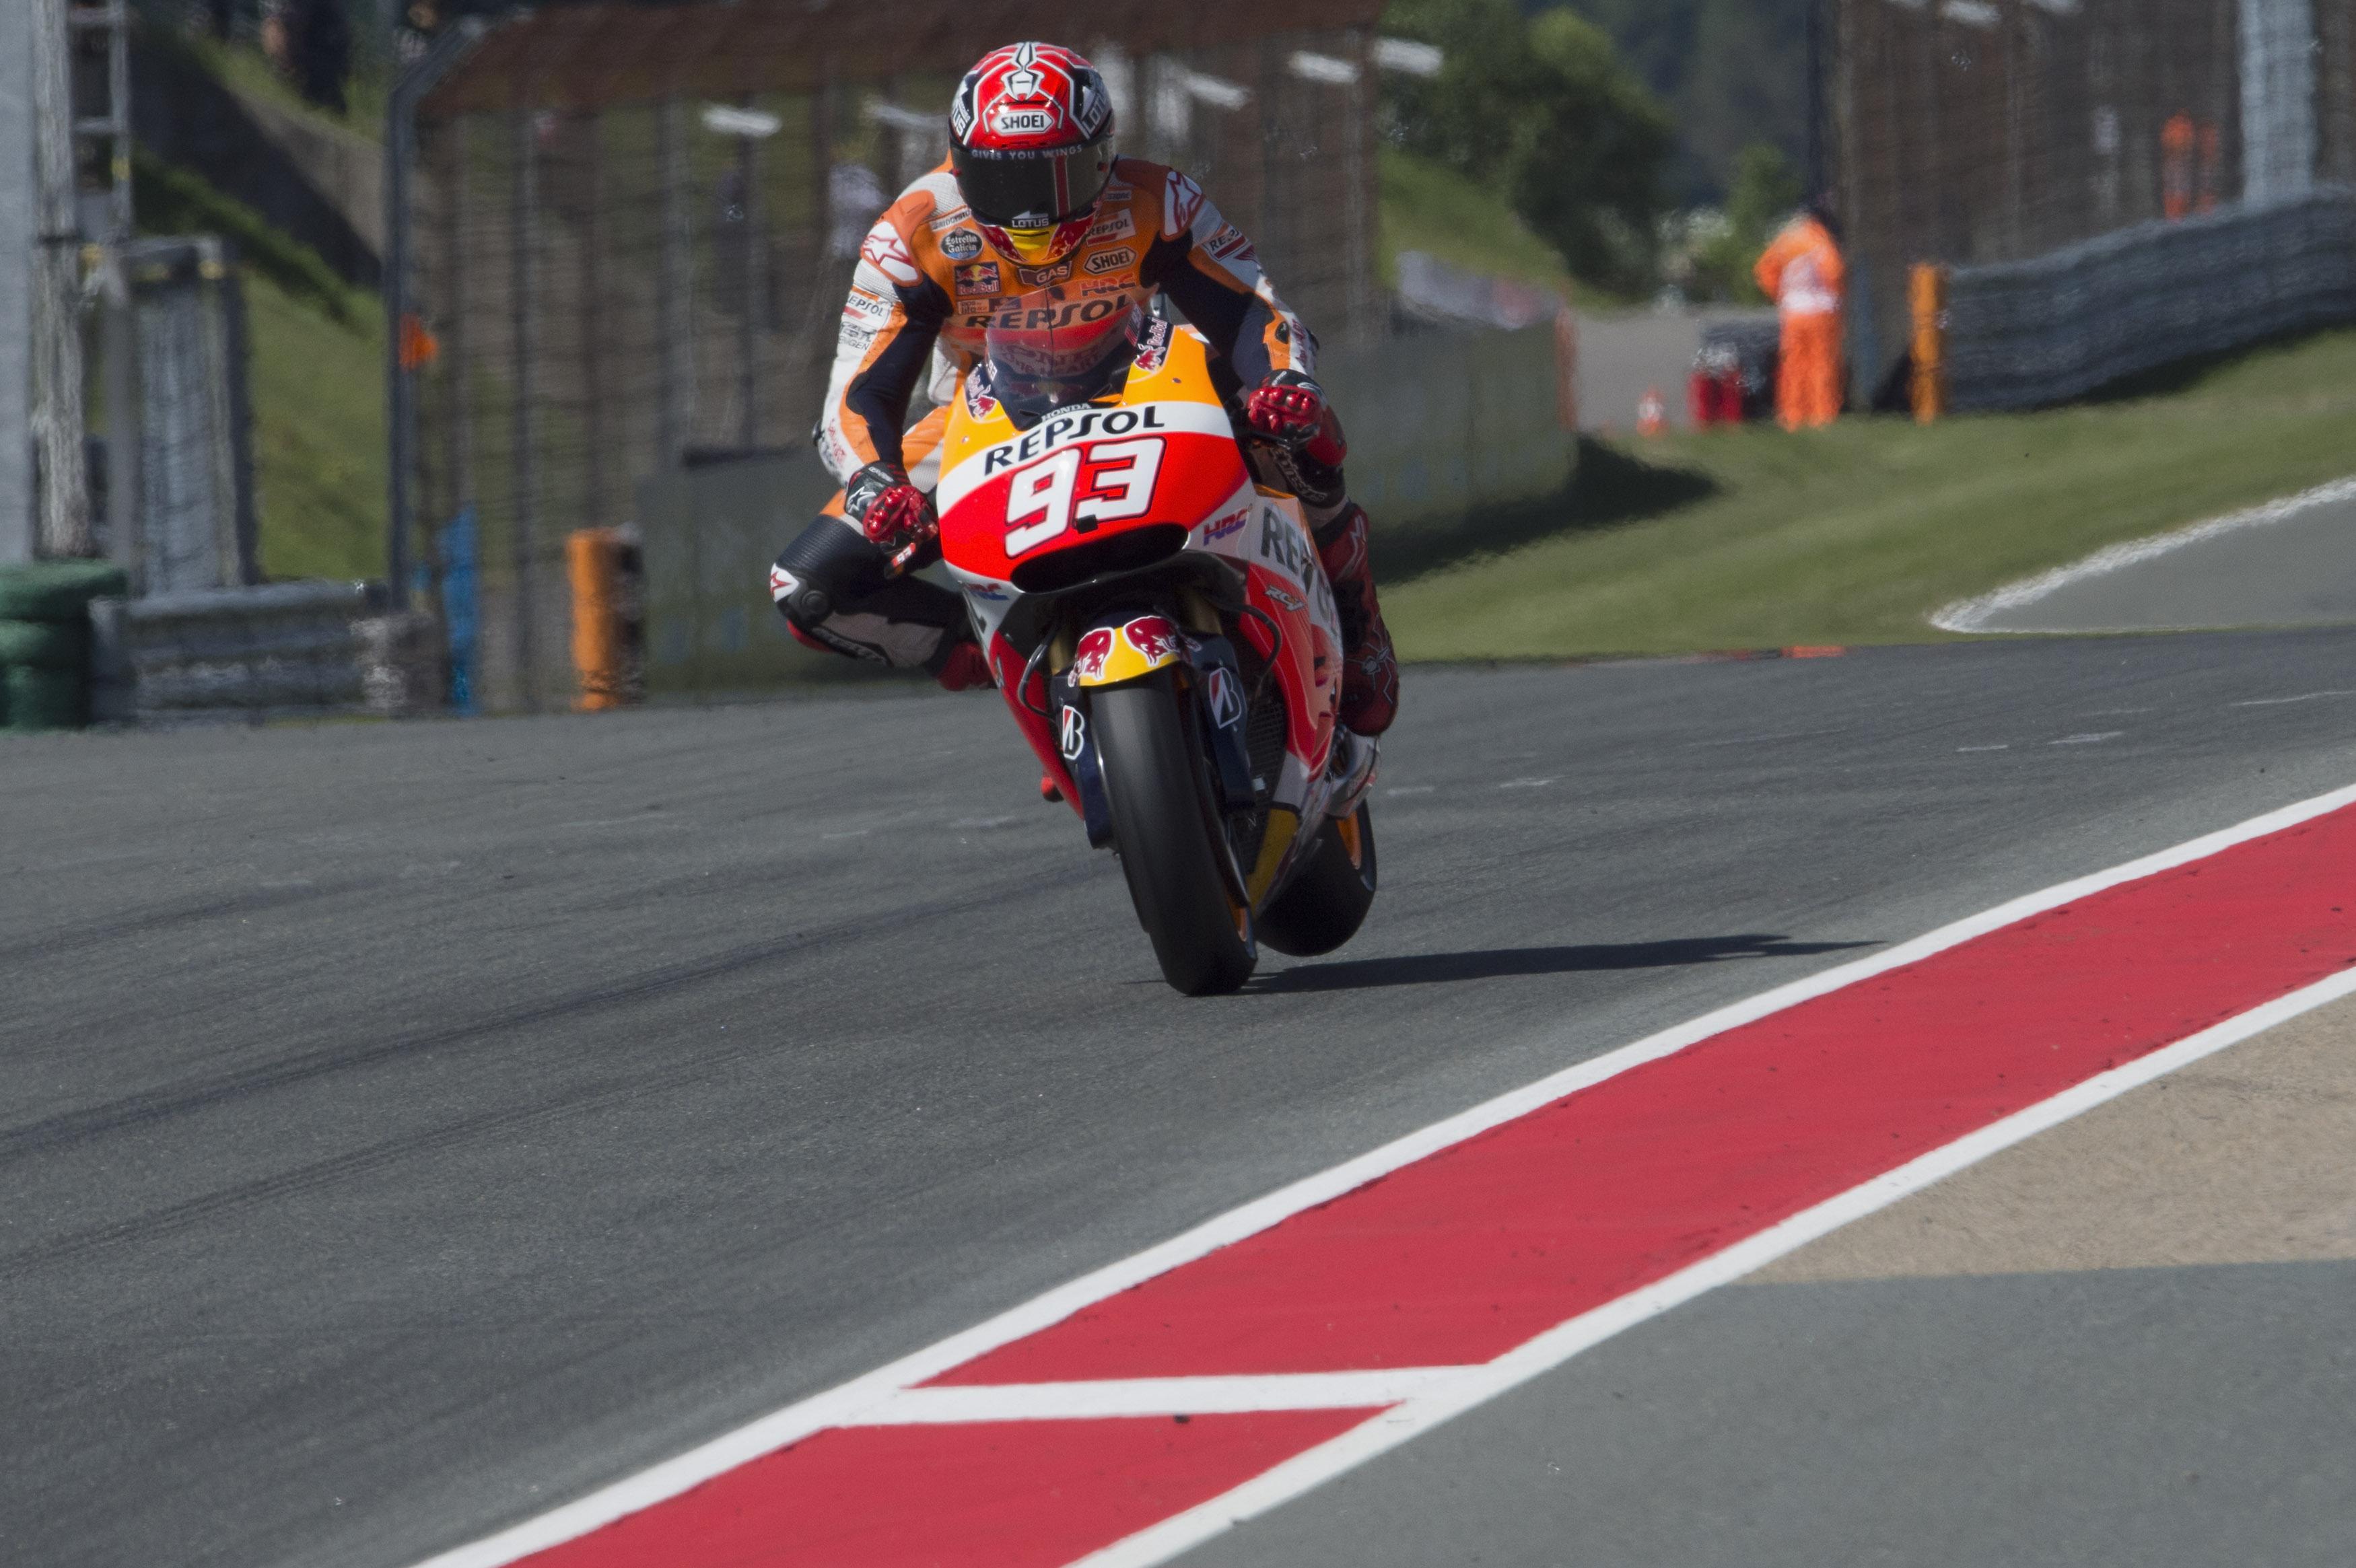 Marc Marquez, quinto successo in questo campionato mondiale